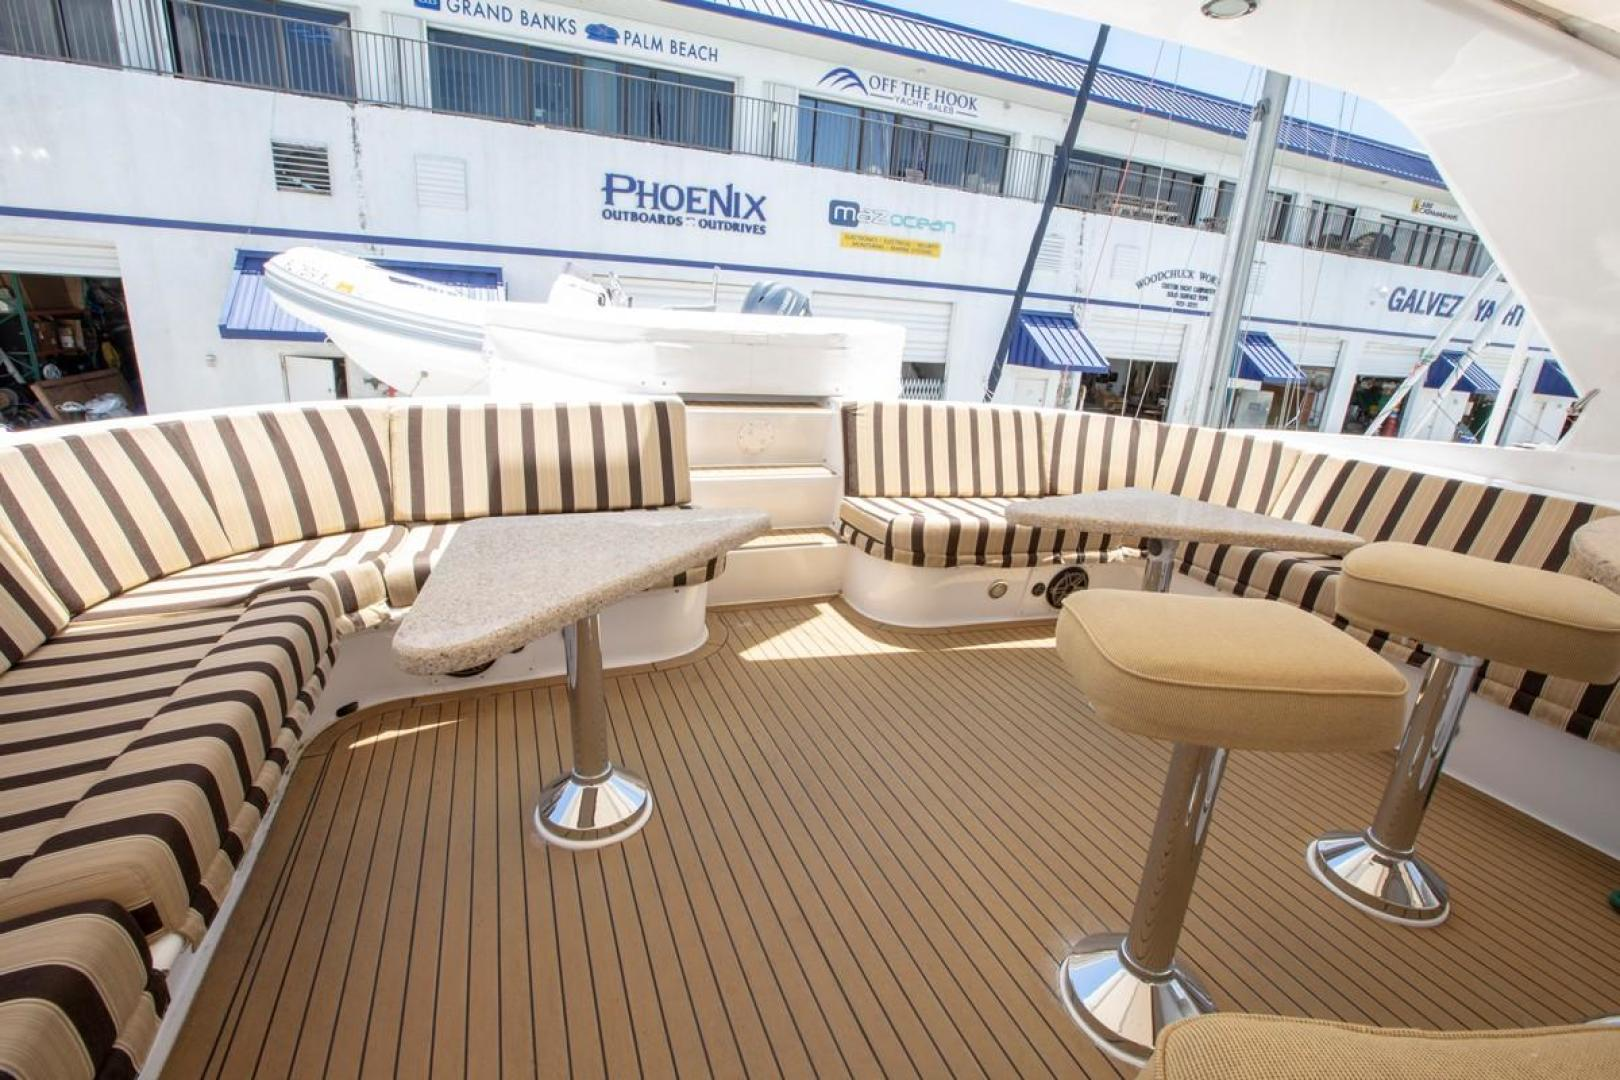 Hatteras-Cockpit Motor Yacht 2000-Getaway Ft. Lauderdale-Florida-United States-977393 | Thumbnail